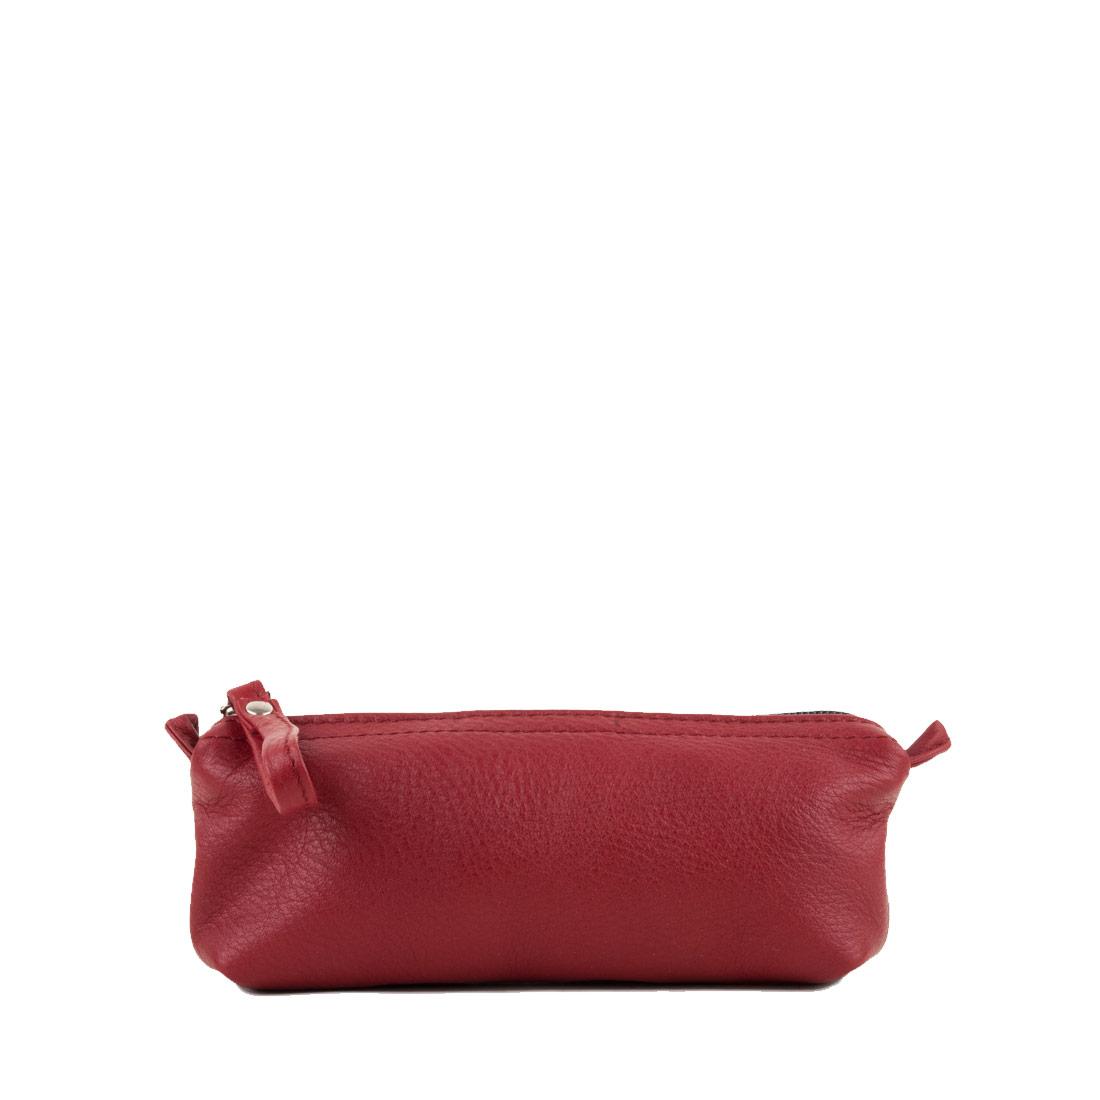 Make Up Bag in Red